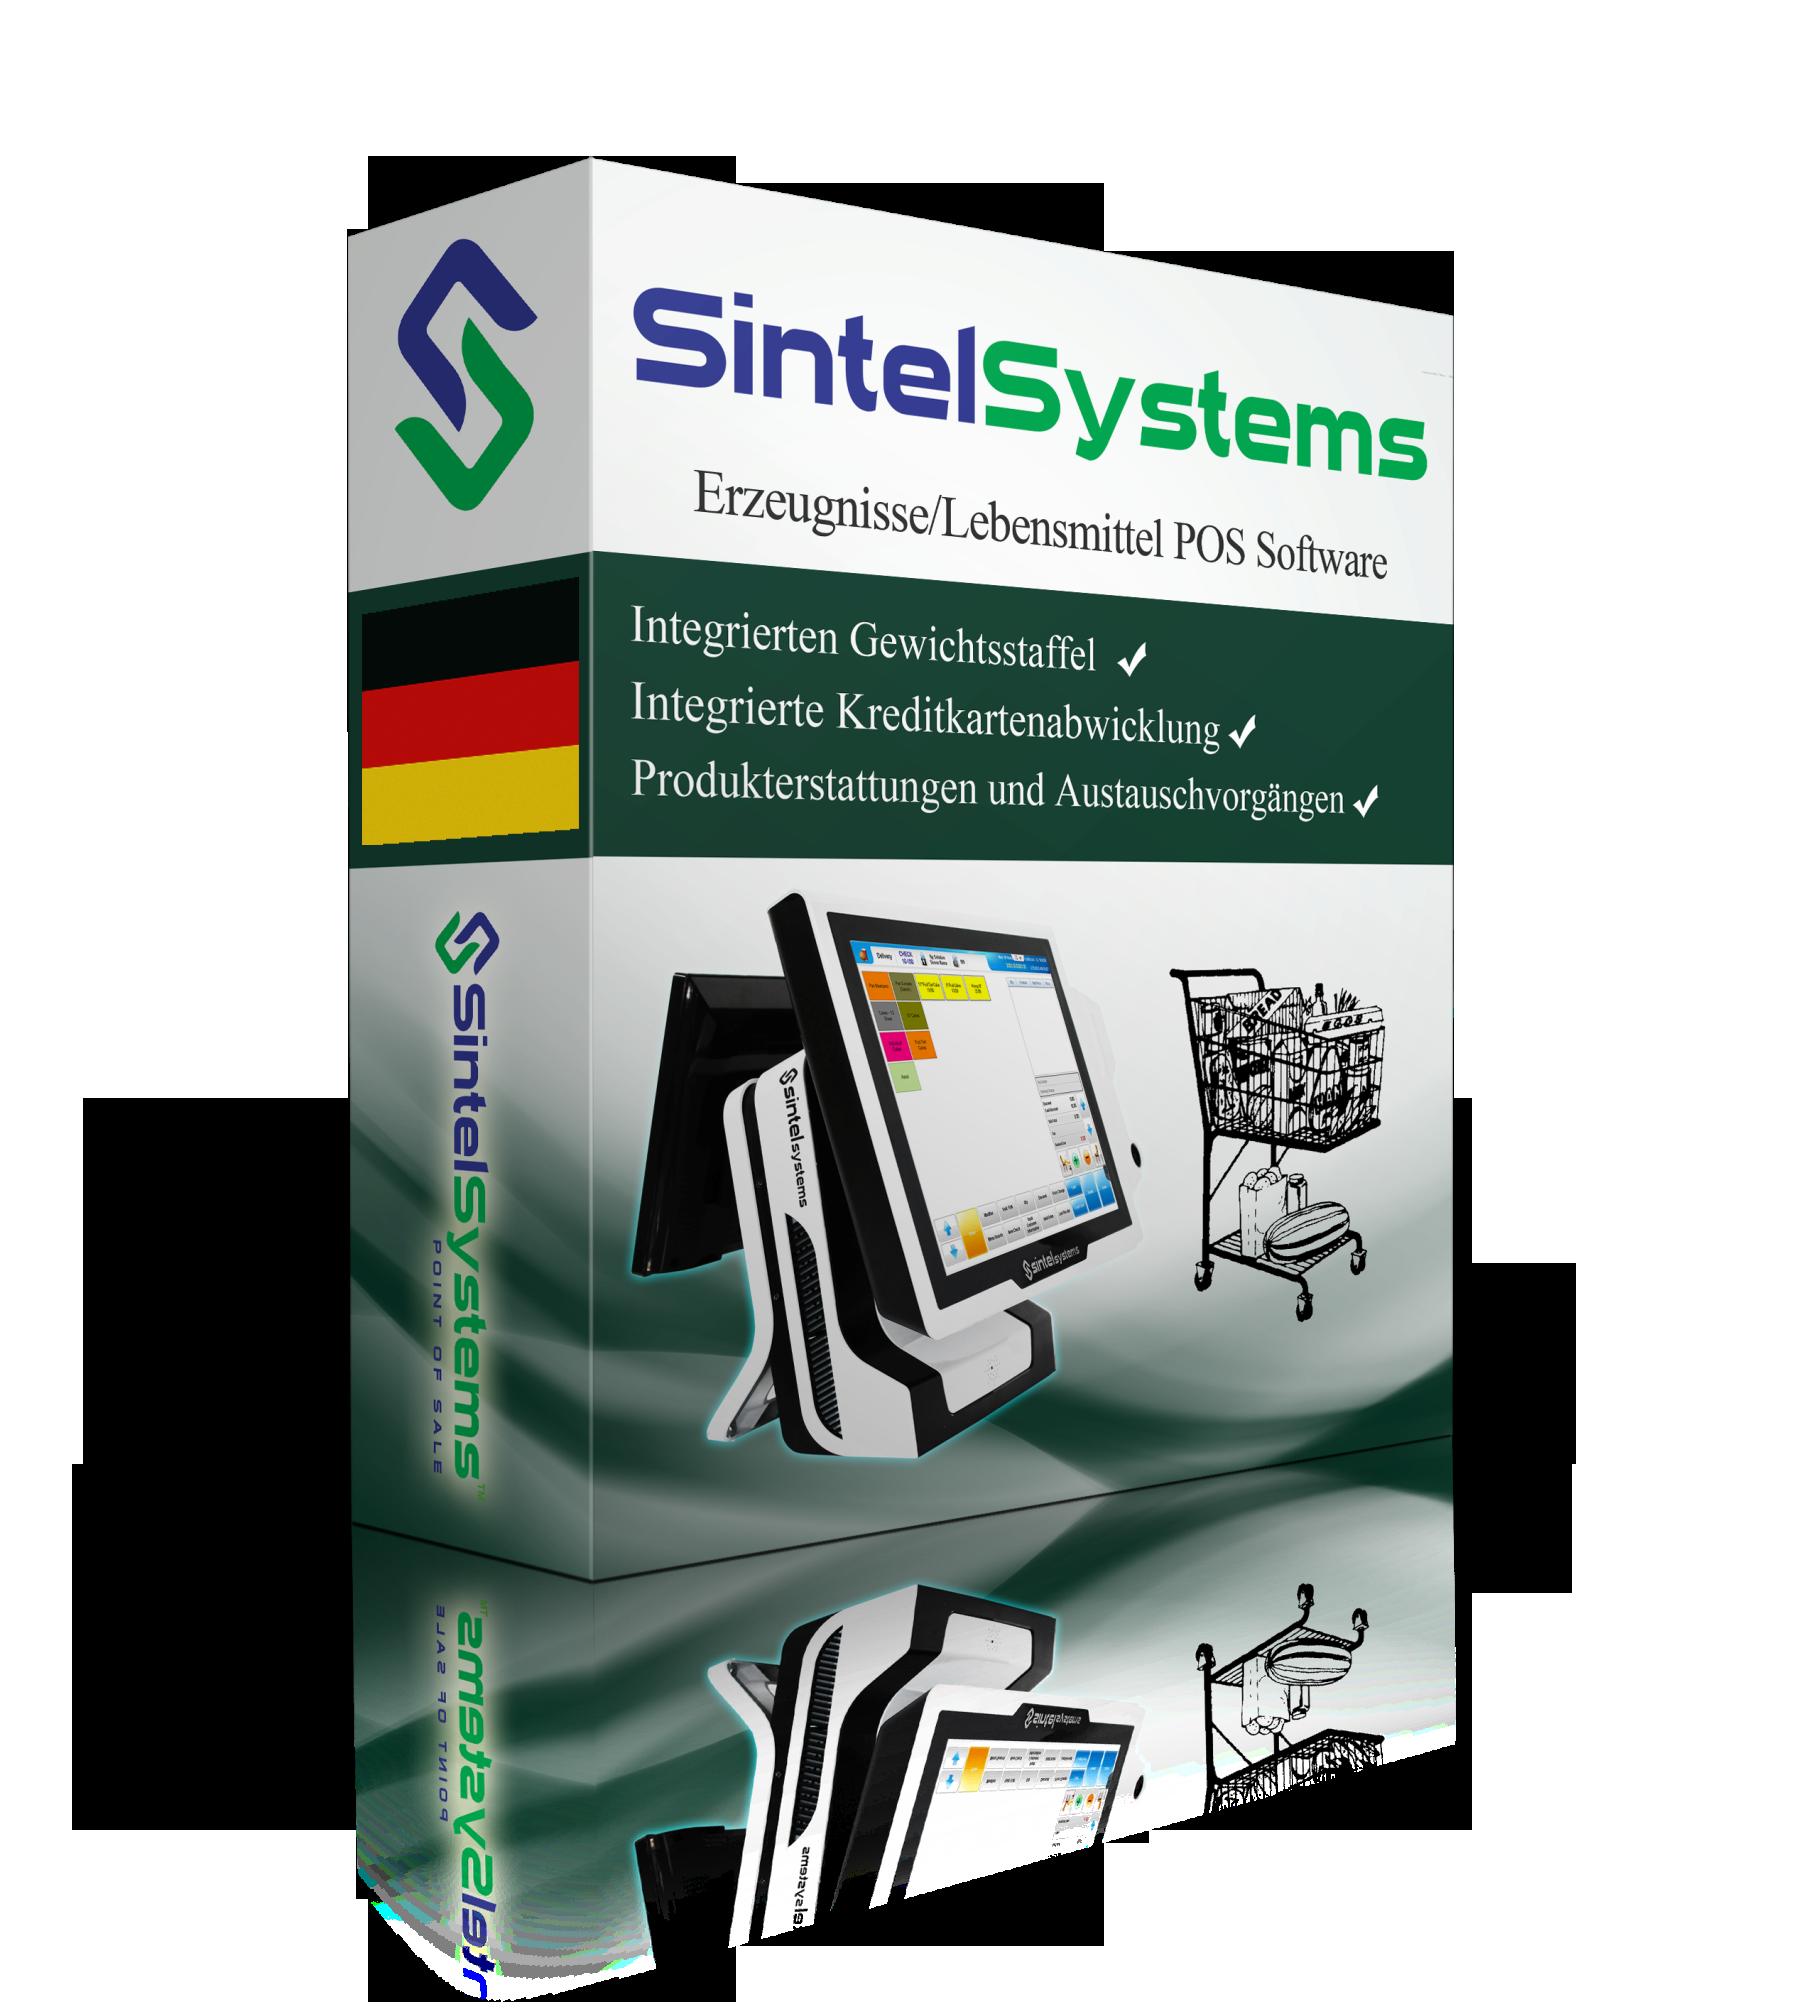 Deutsch-Supermarkt-Lebensmittel -POS-Kassensysteme-Kassensoftware-Software-Sintel-Systems-855-POS-SALE-www.SintelSystemsPOS.com